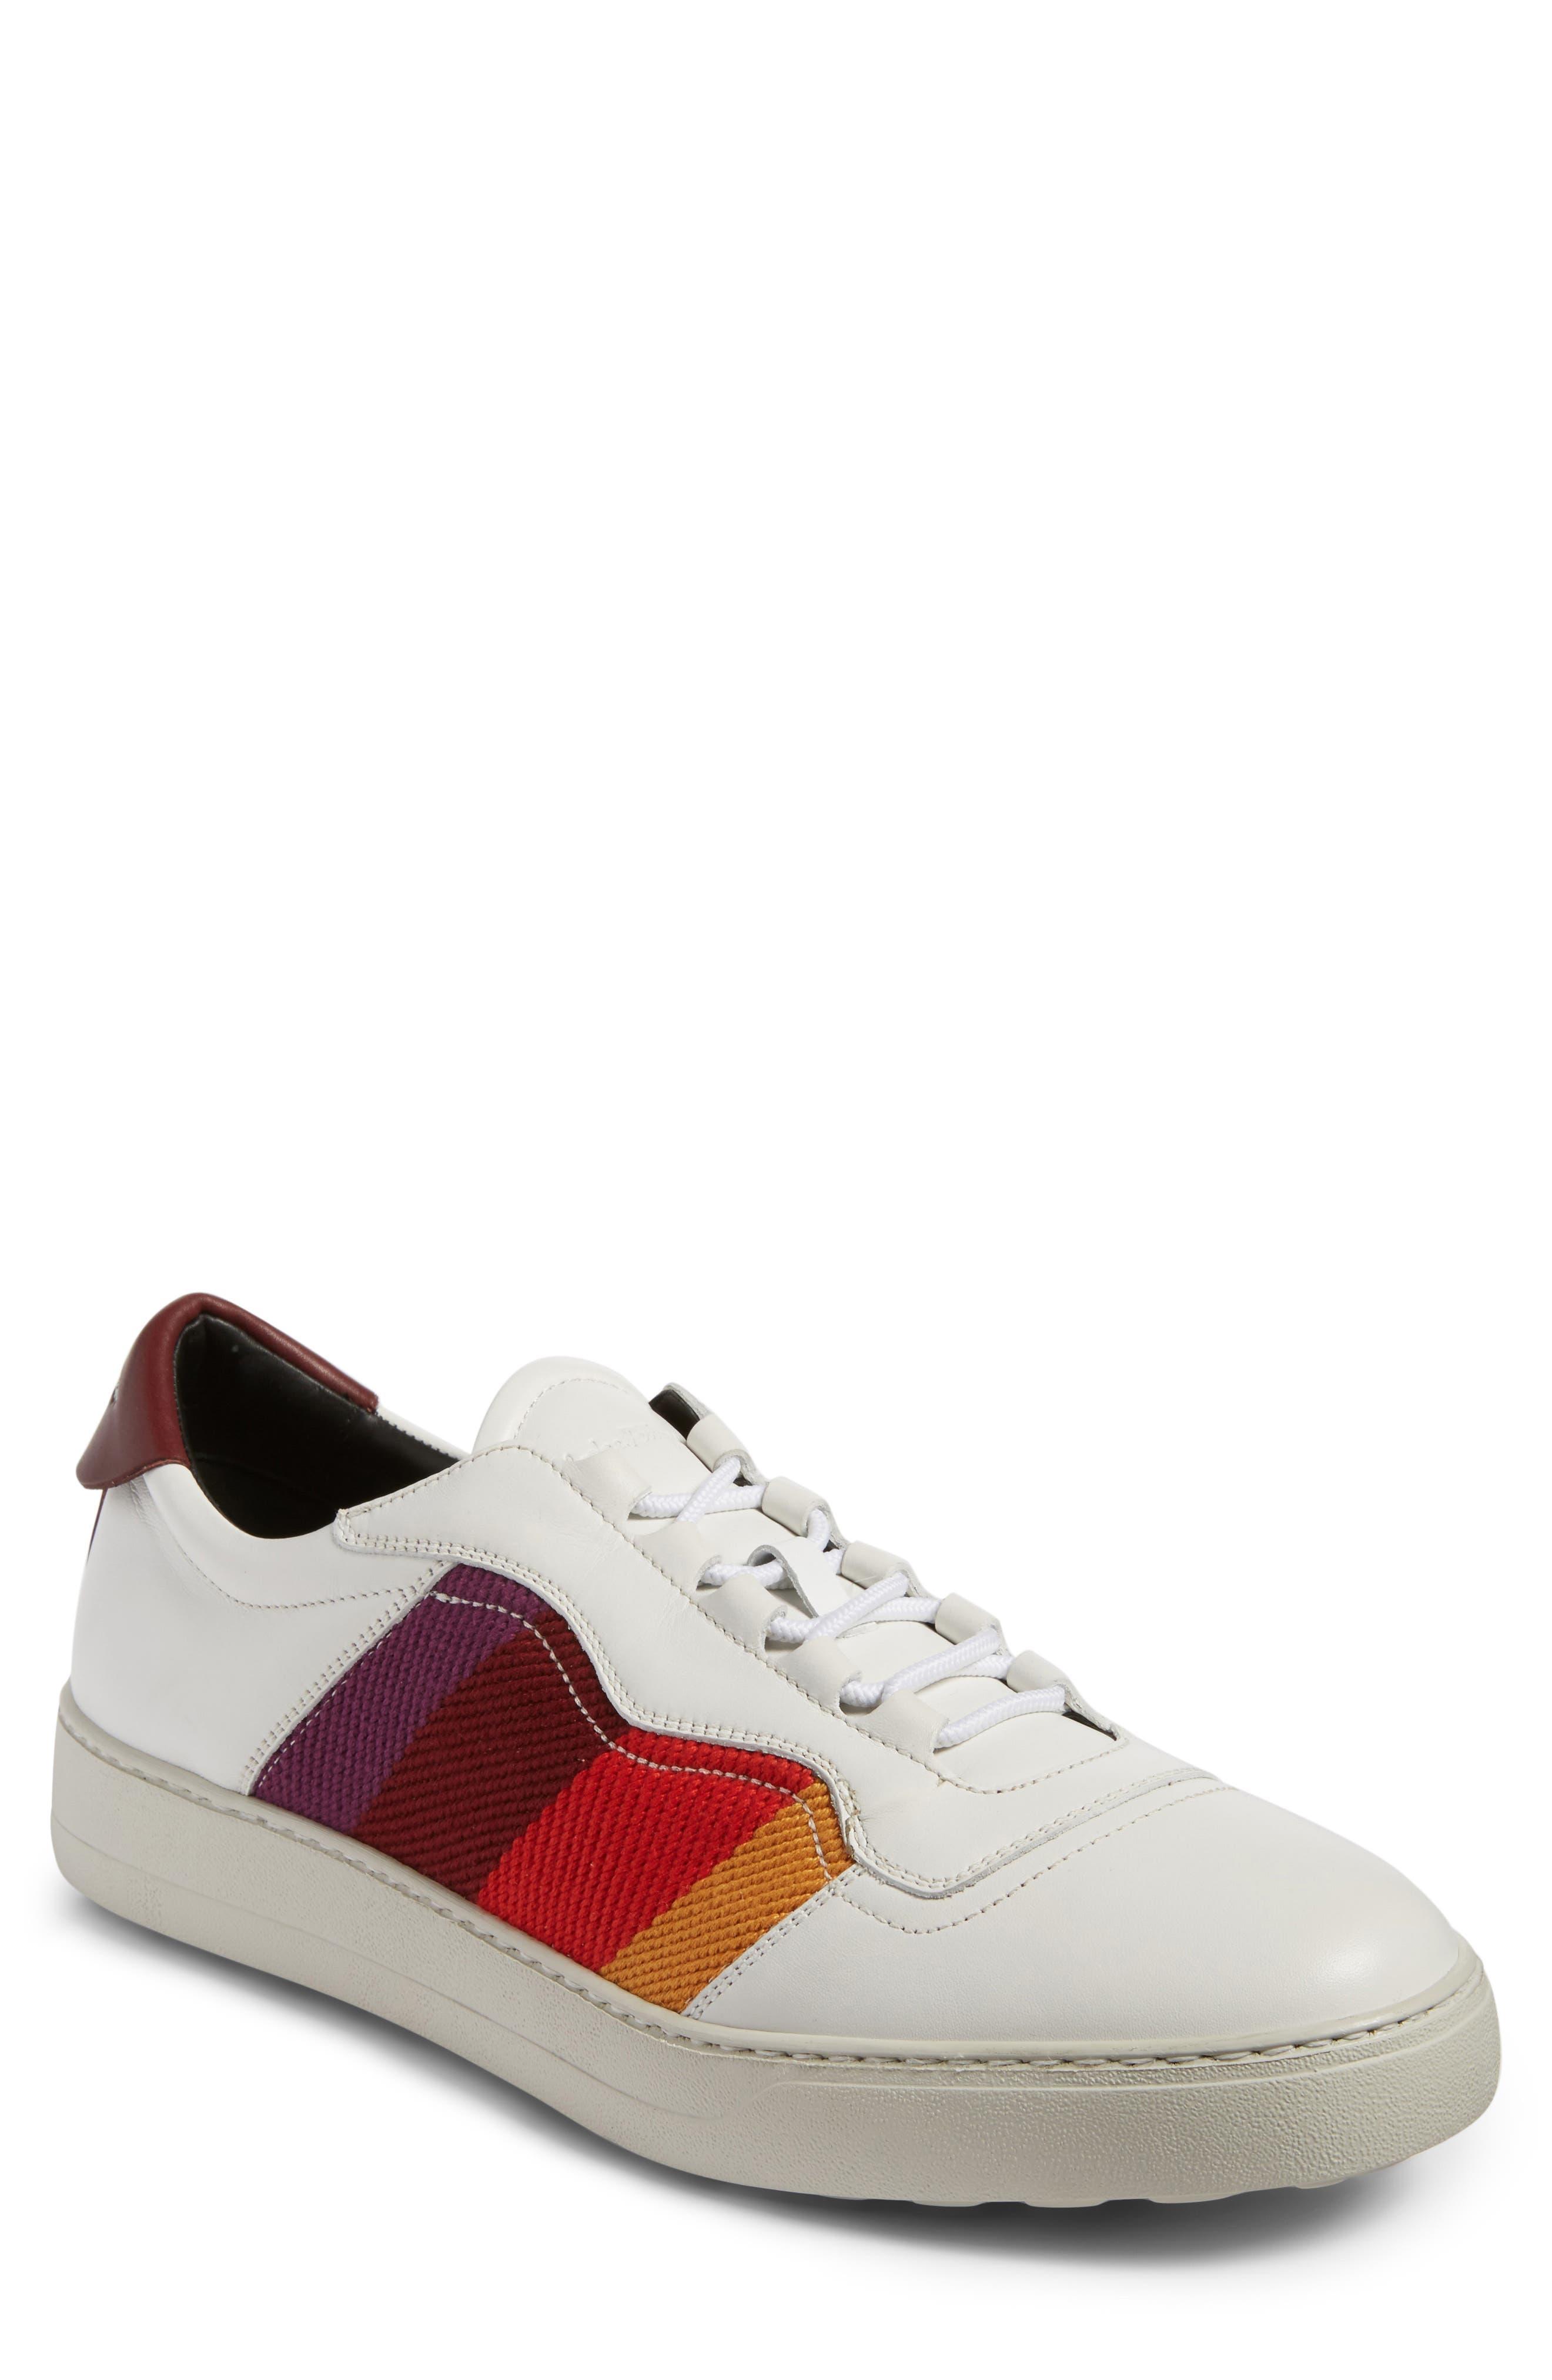 Salvatore Ferragamo Divo Sneaker (Men)